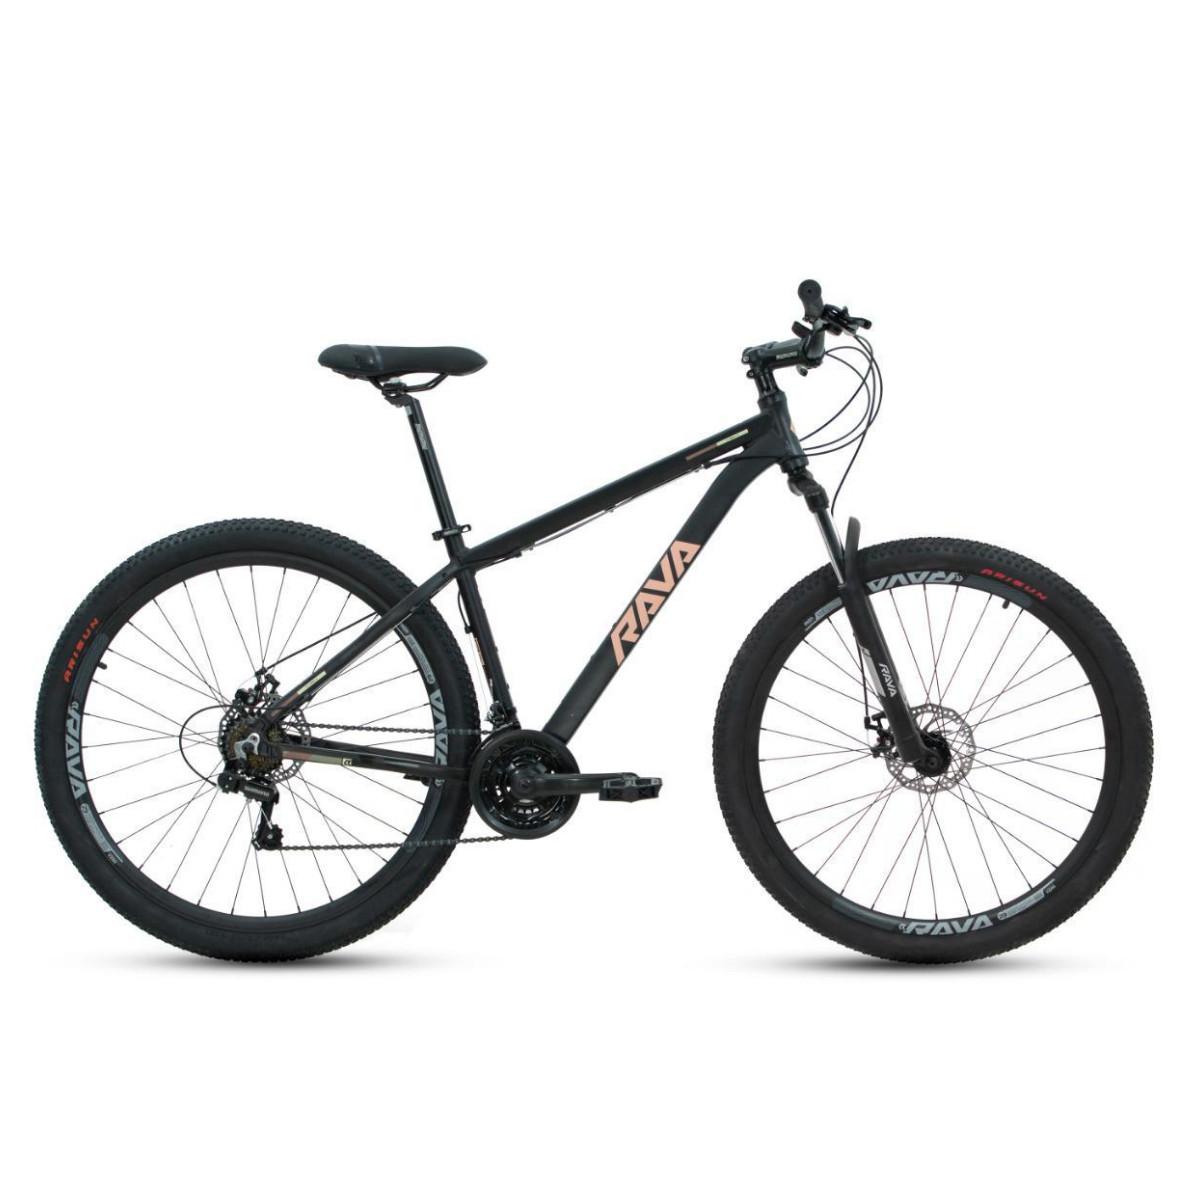 Bicicleta Mtb Rava Pressure 21V 2021 - Preto e Salmão